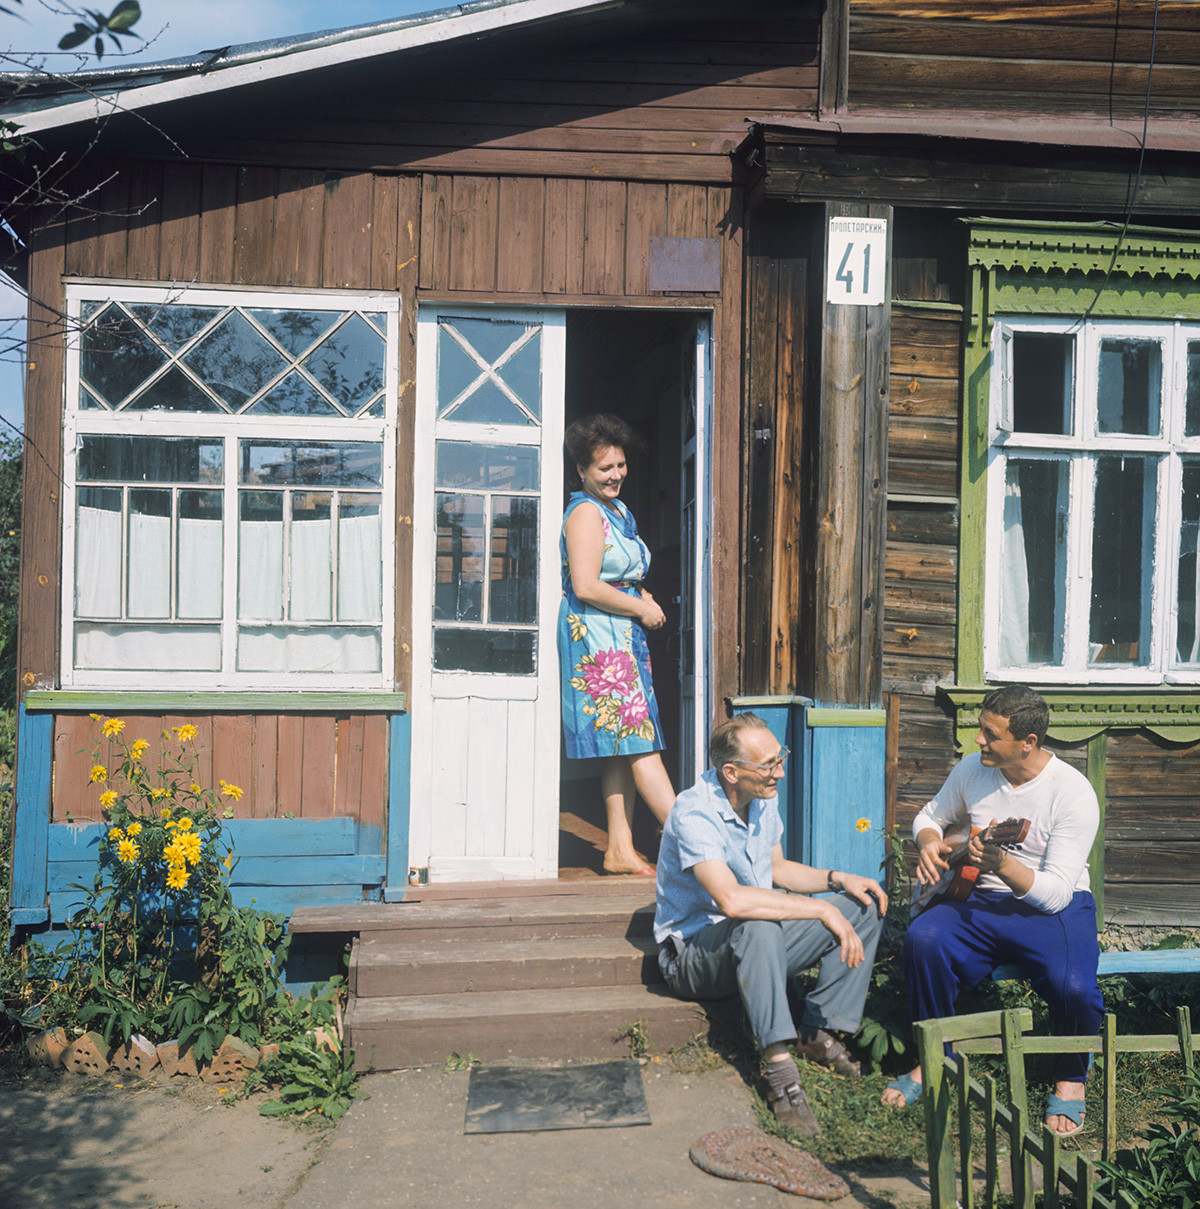 O cosmonauta soviético Vladislav Volkov na dátcha, com a mulher e o sogro.